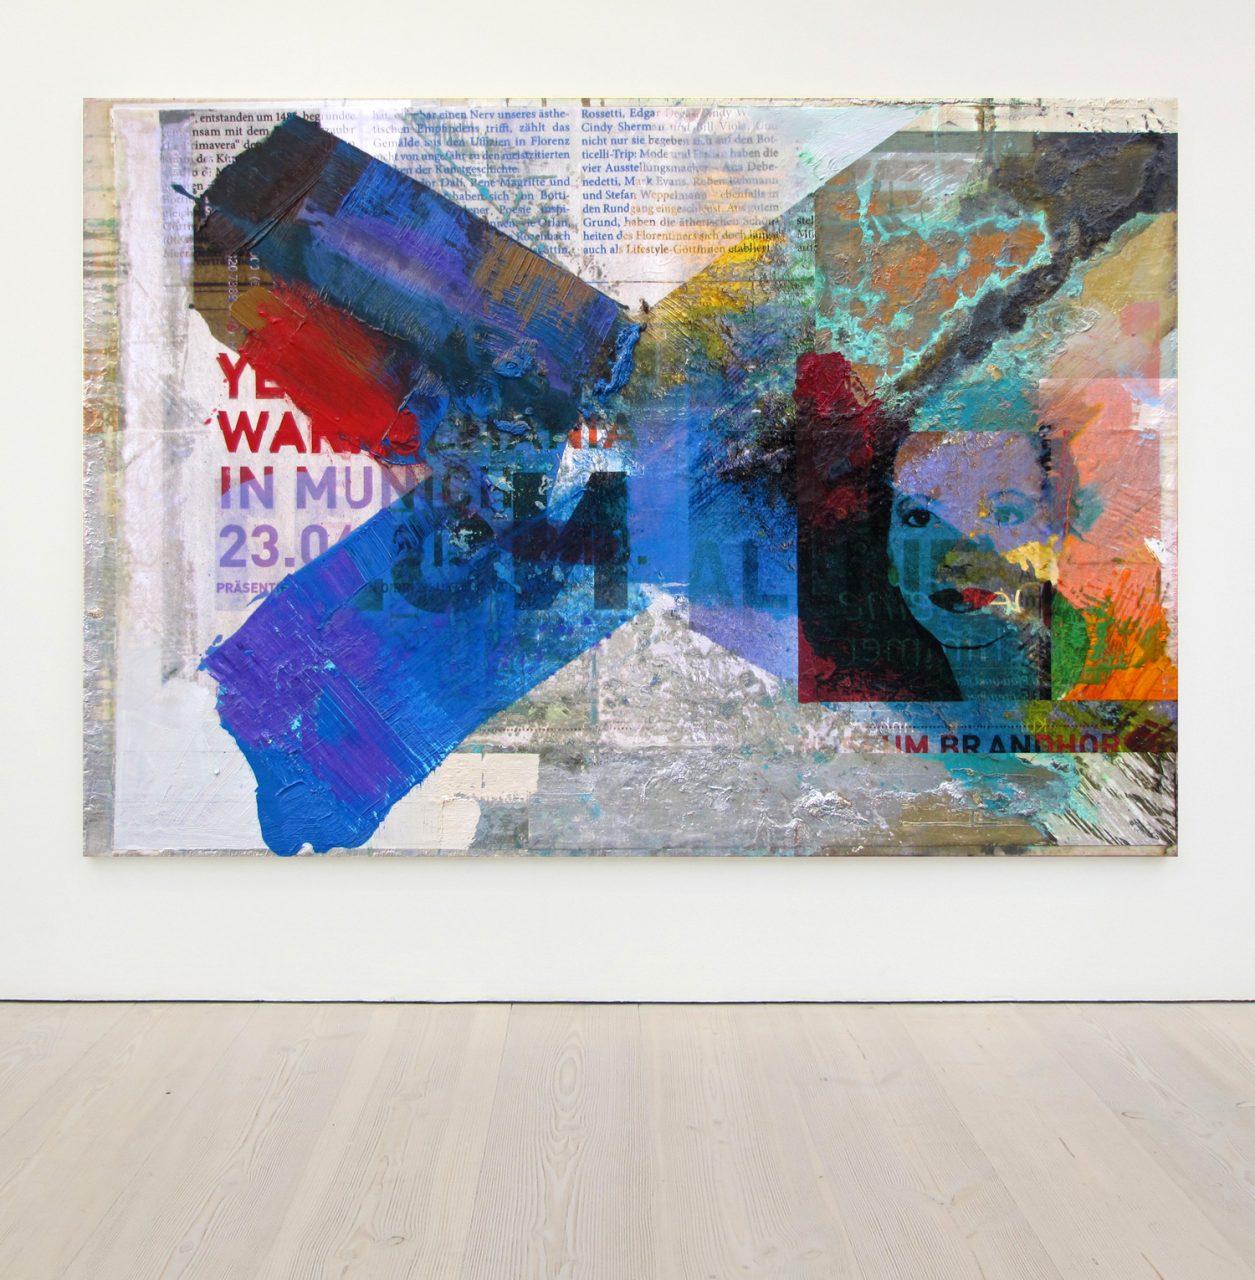 Advertisement Museum Brandhorst | 2016 | Acrylic Oil and Digital Prints on Canvas | 140 x 200 cm